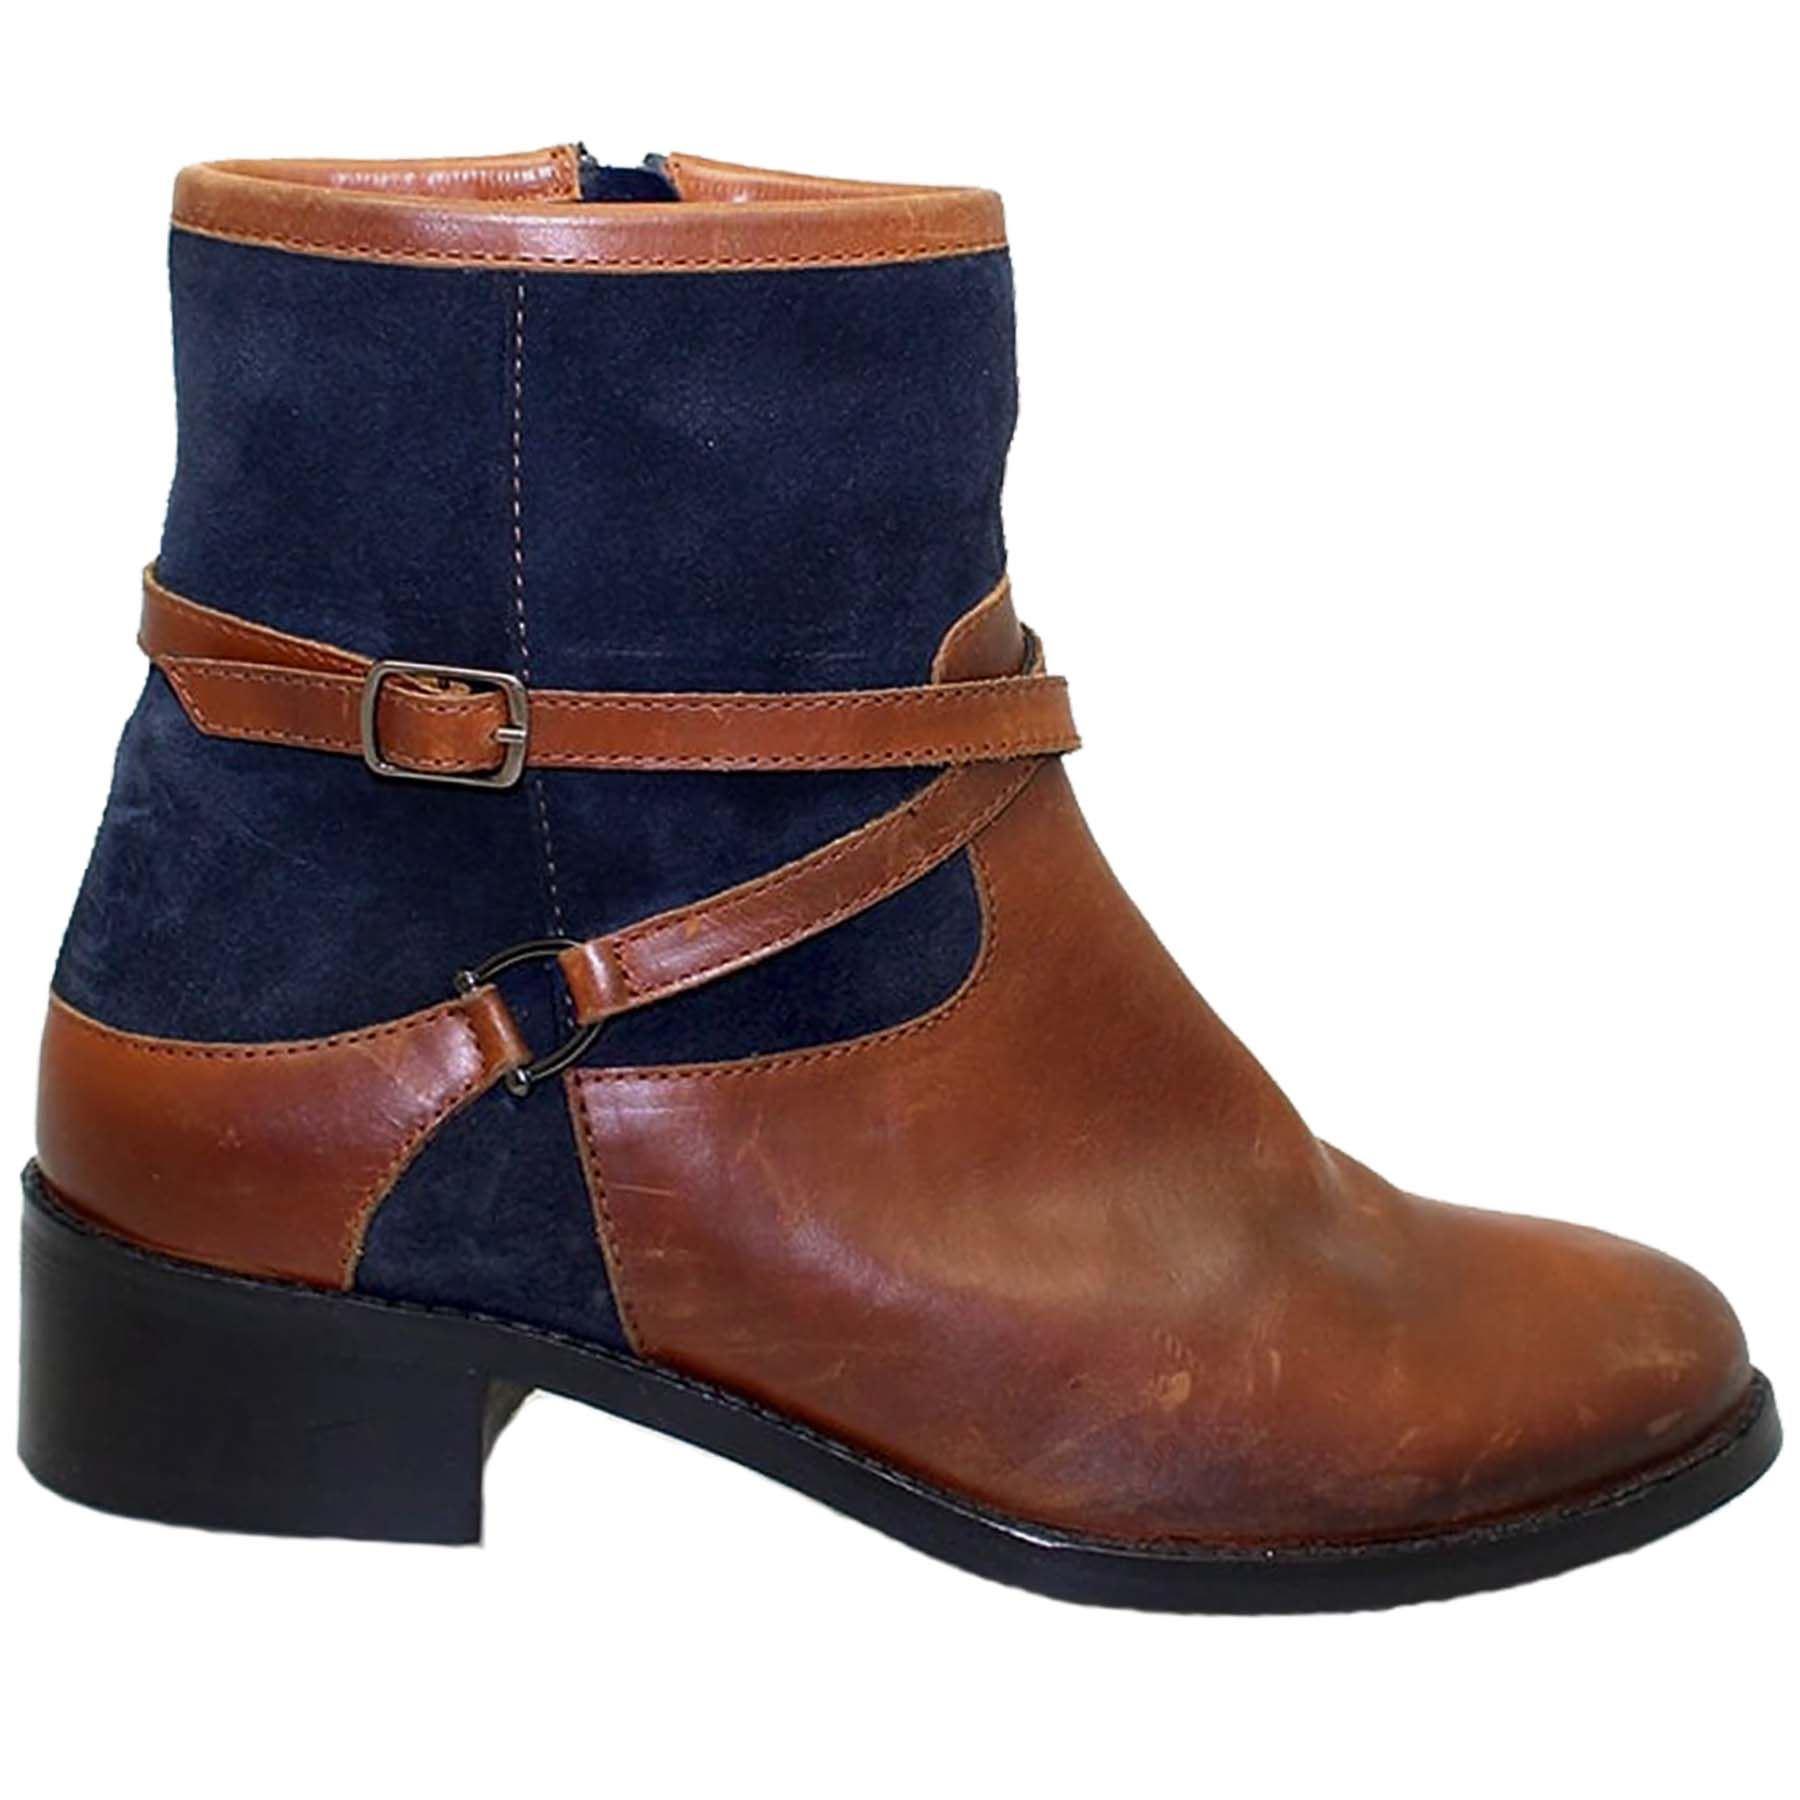 Glh460 Duty Ladies Leather Suede Contrast Low Block Heel